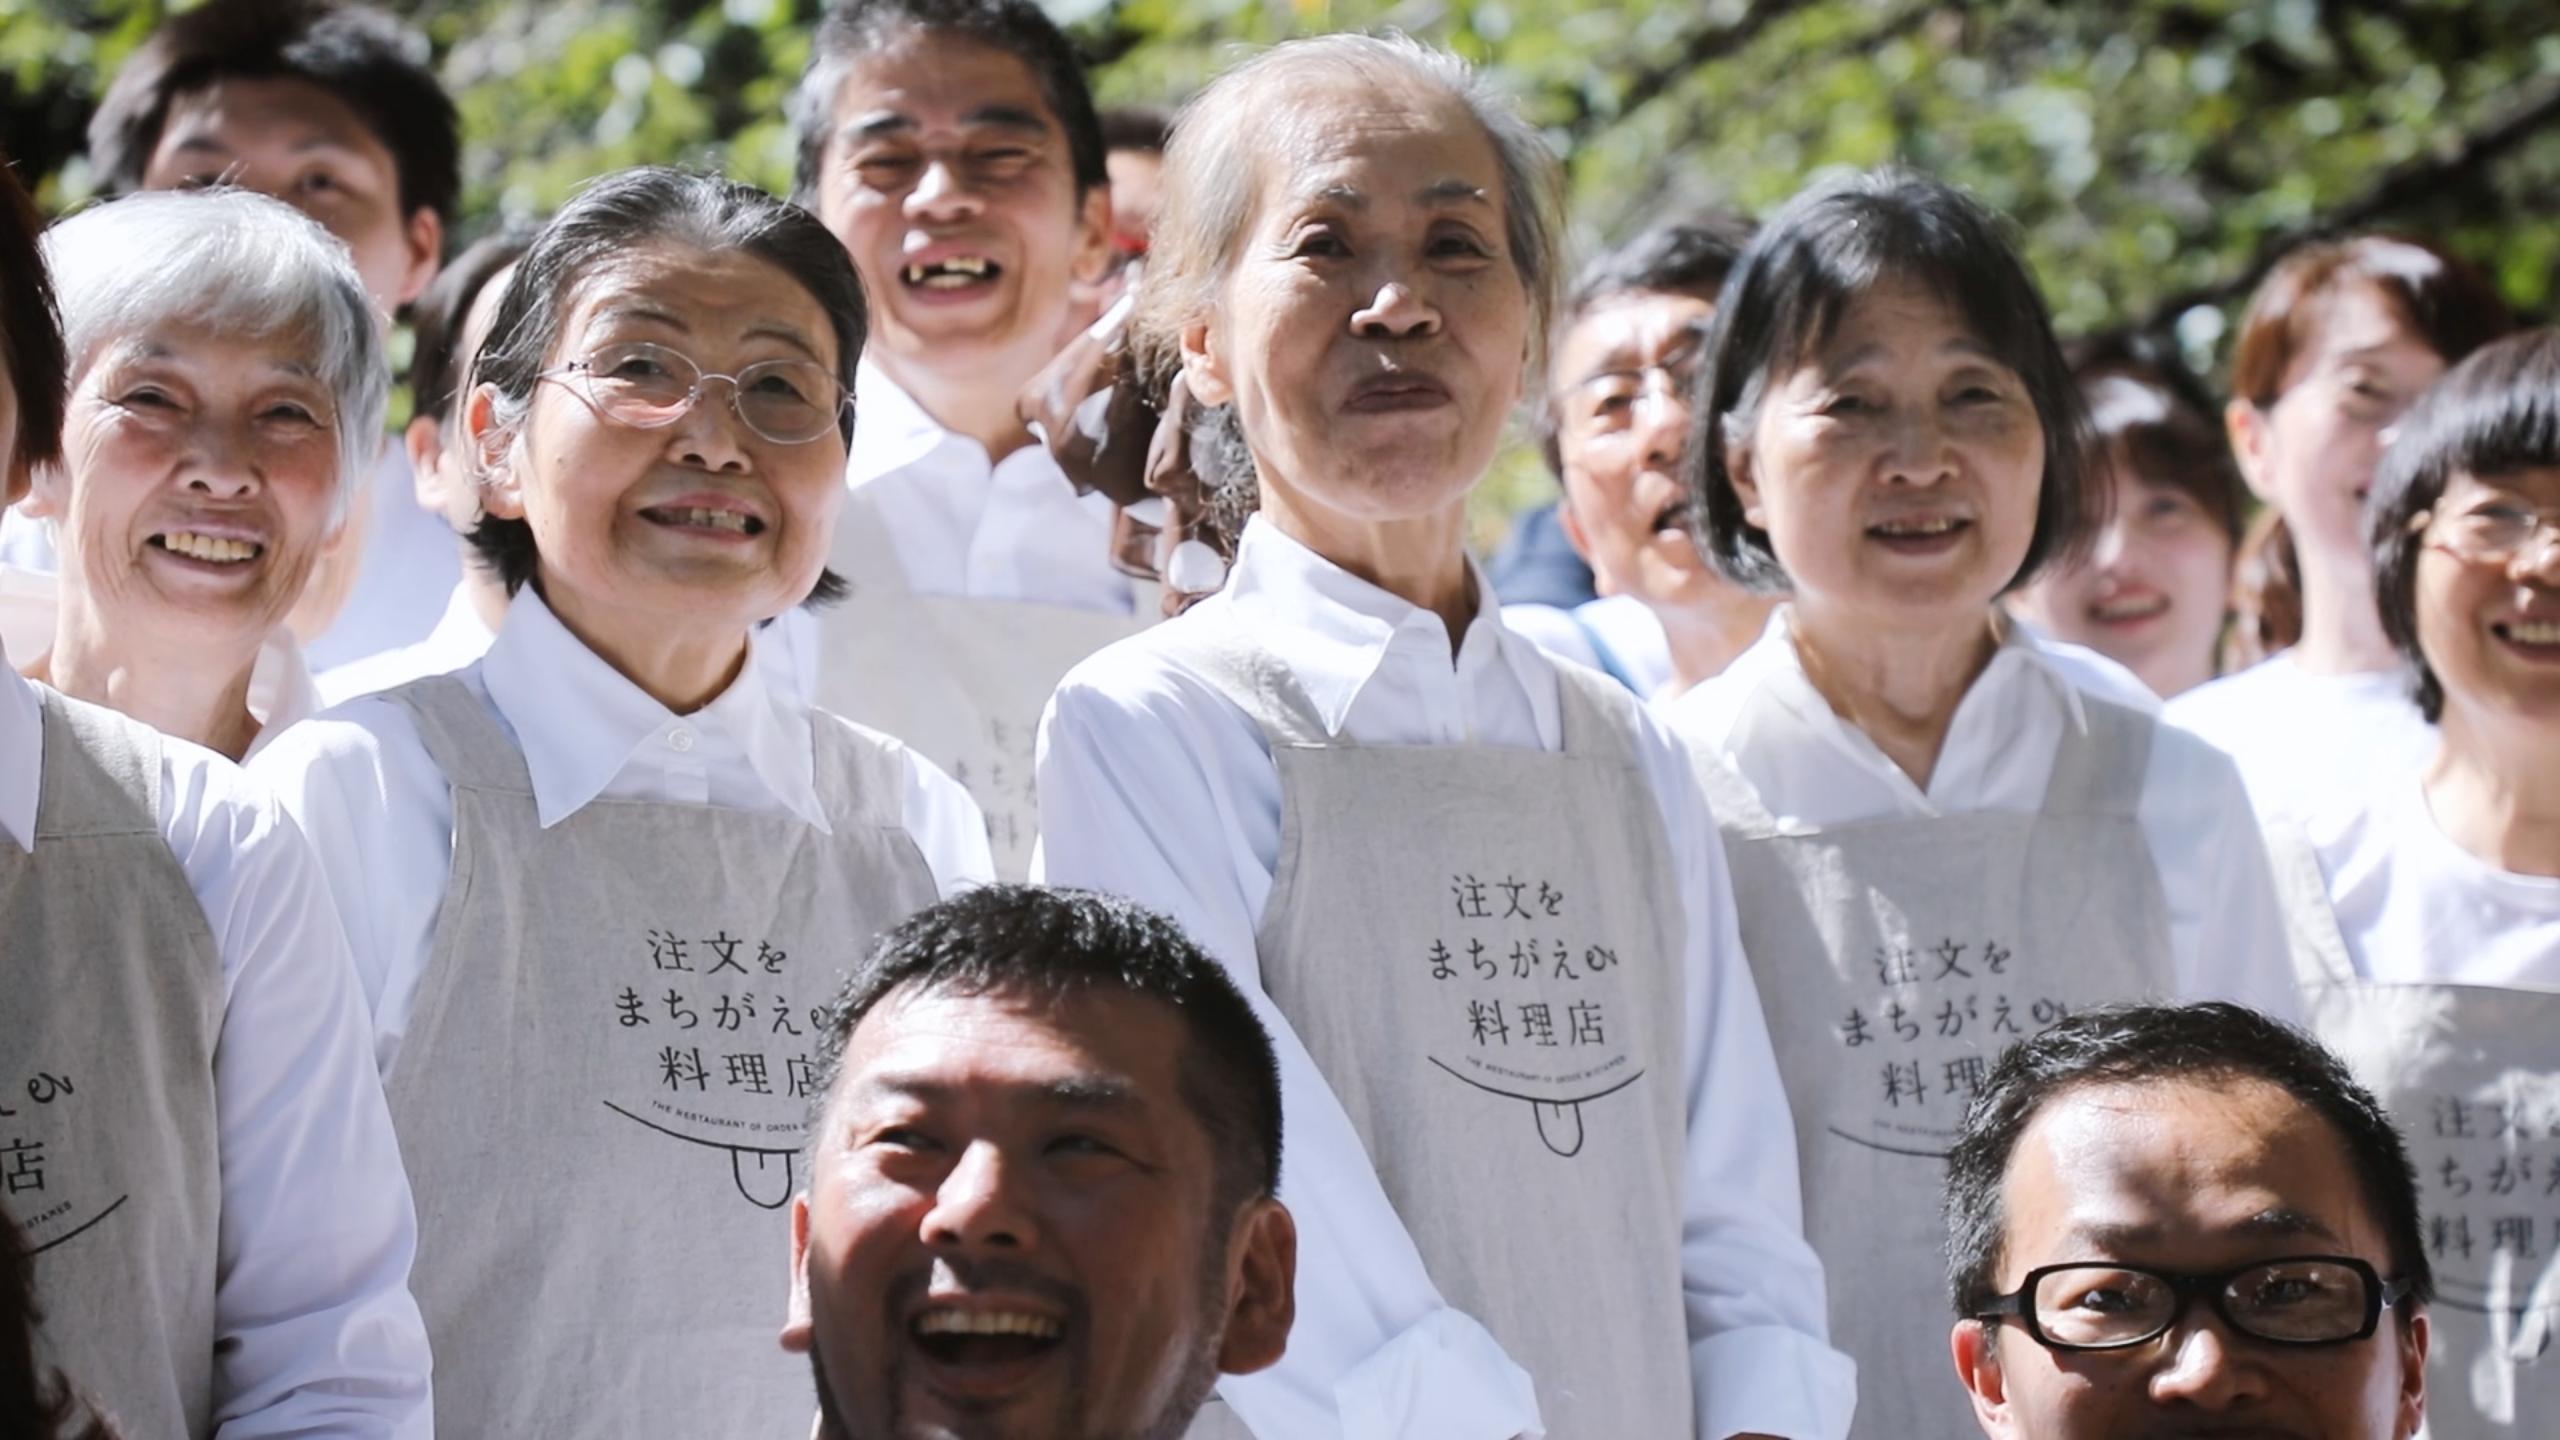 'Restaurant of Mistaken Orders' Receives PR Award Grand Prix 2019